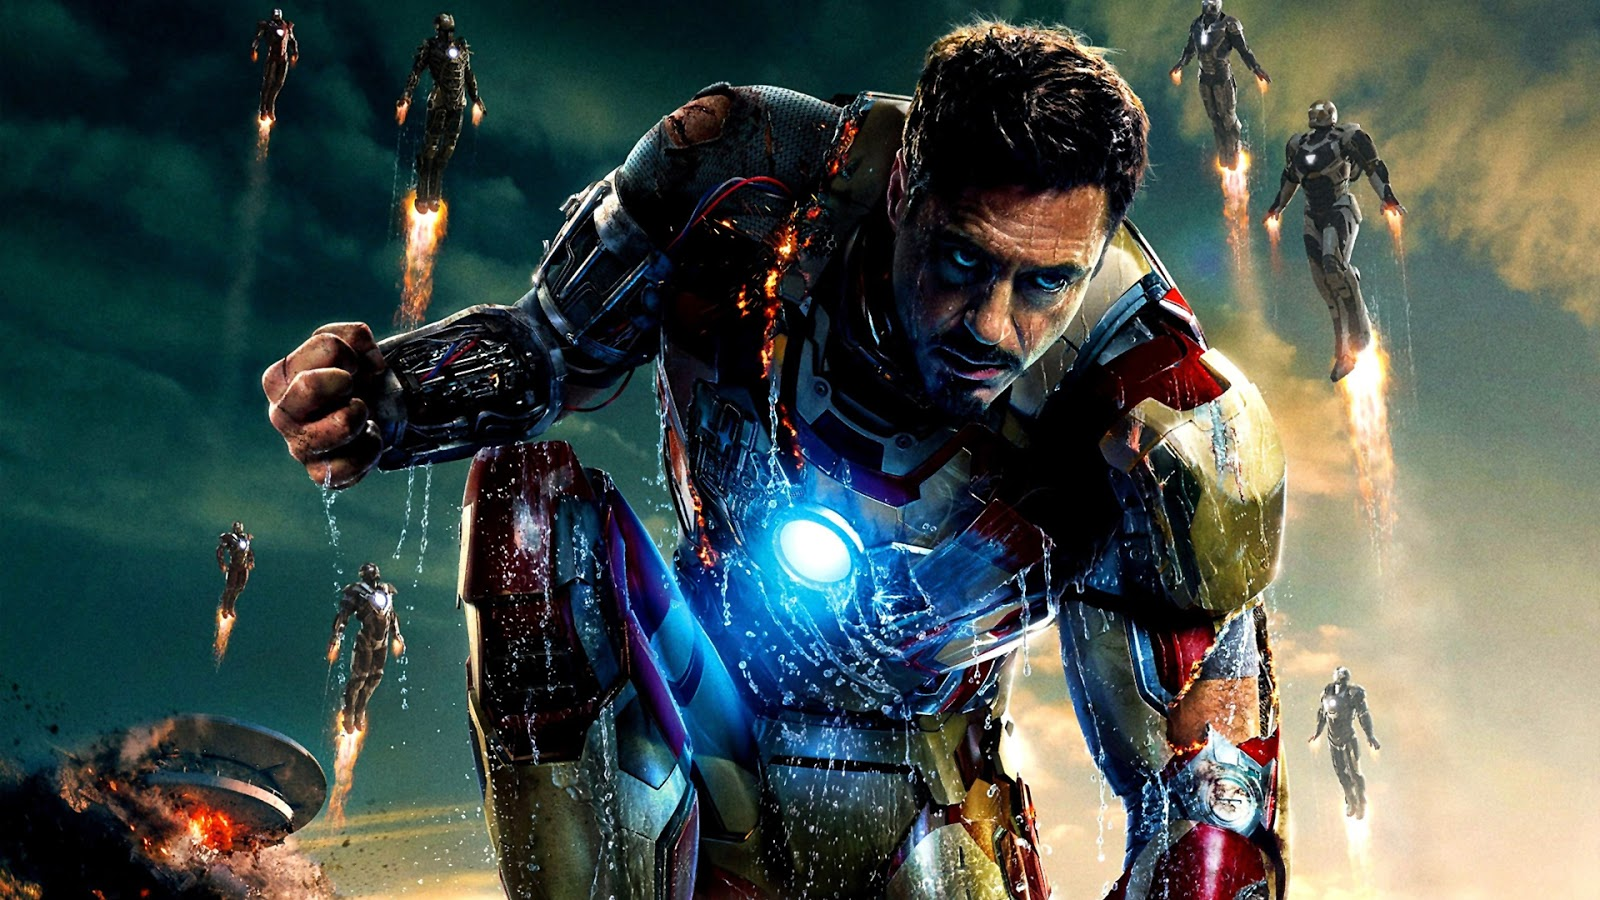 Hd Wallpapers Iron Man: Iron Man HD Wallpapers 1080p